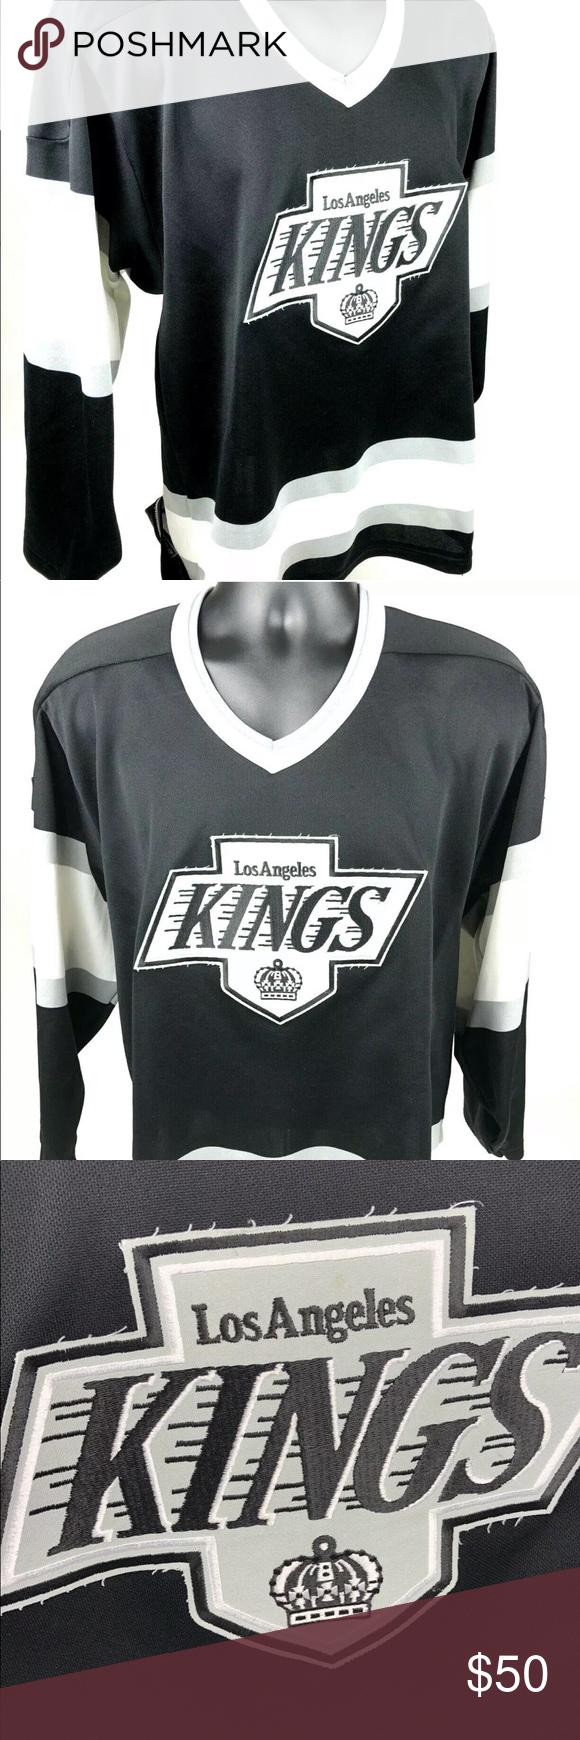 Vintage 90 Los Angeles La Kings Ccm Hockey Jersey Ccm Hockey Hockey Jersey La Kings